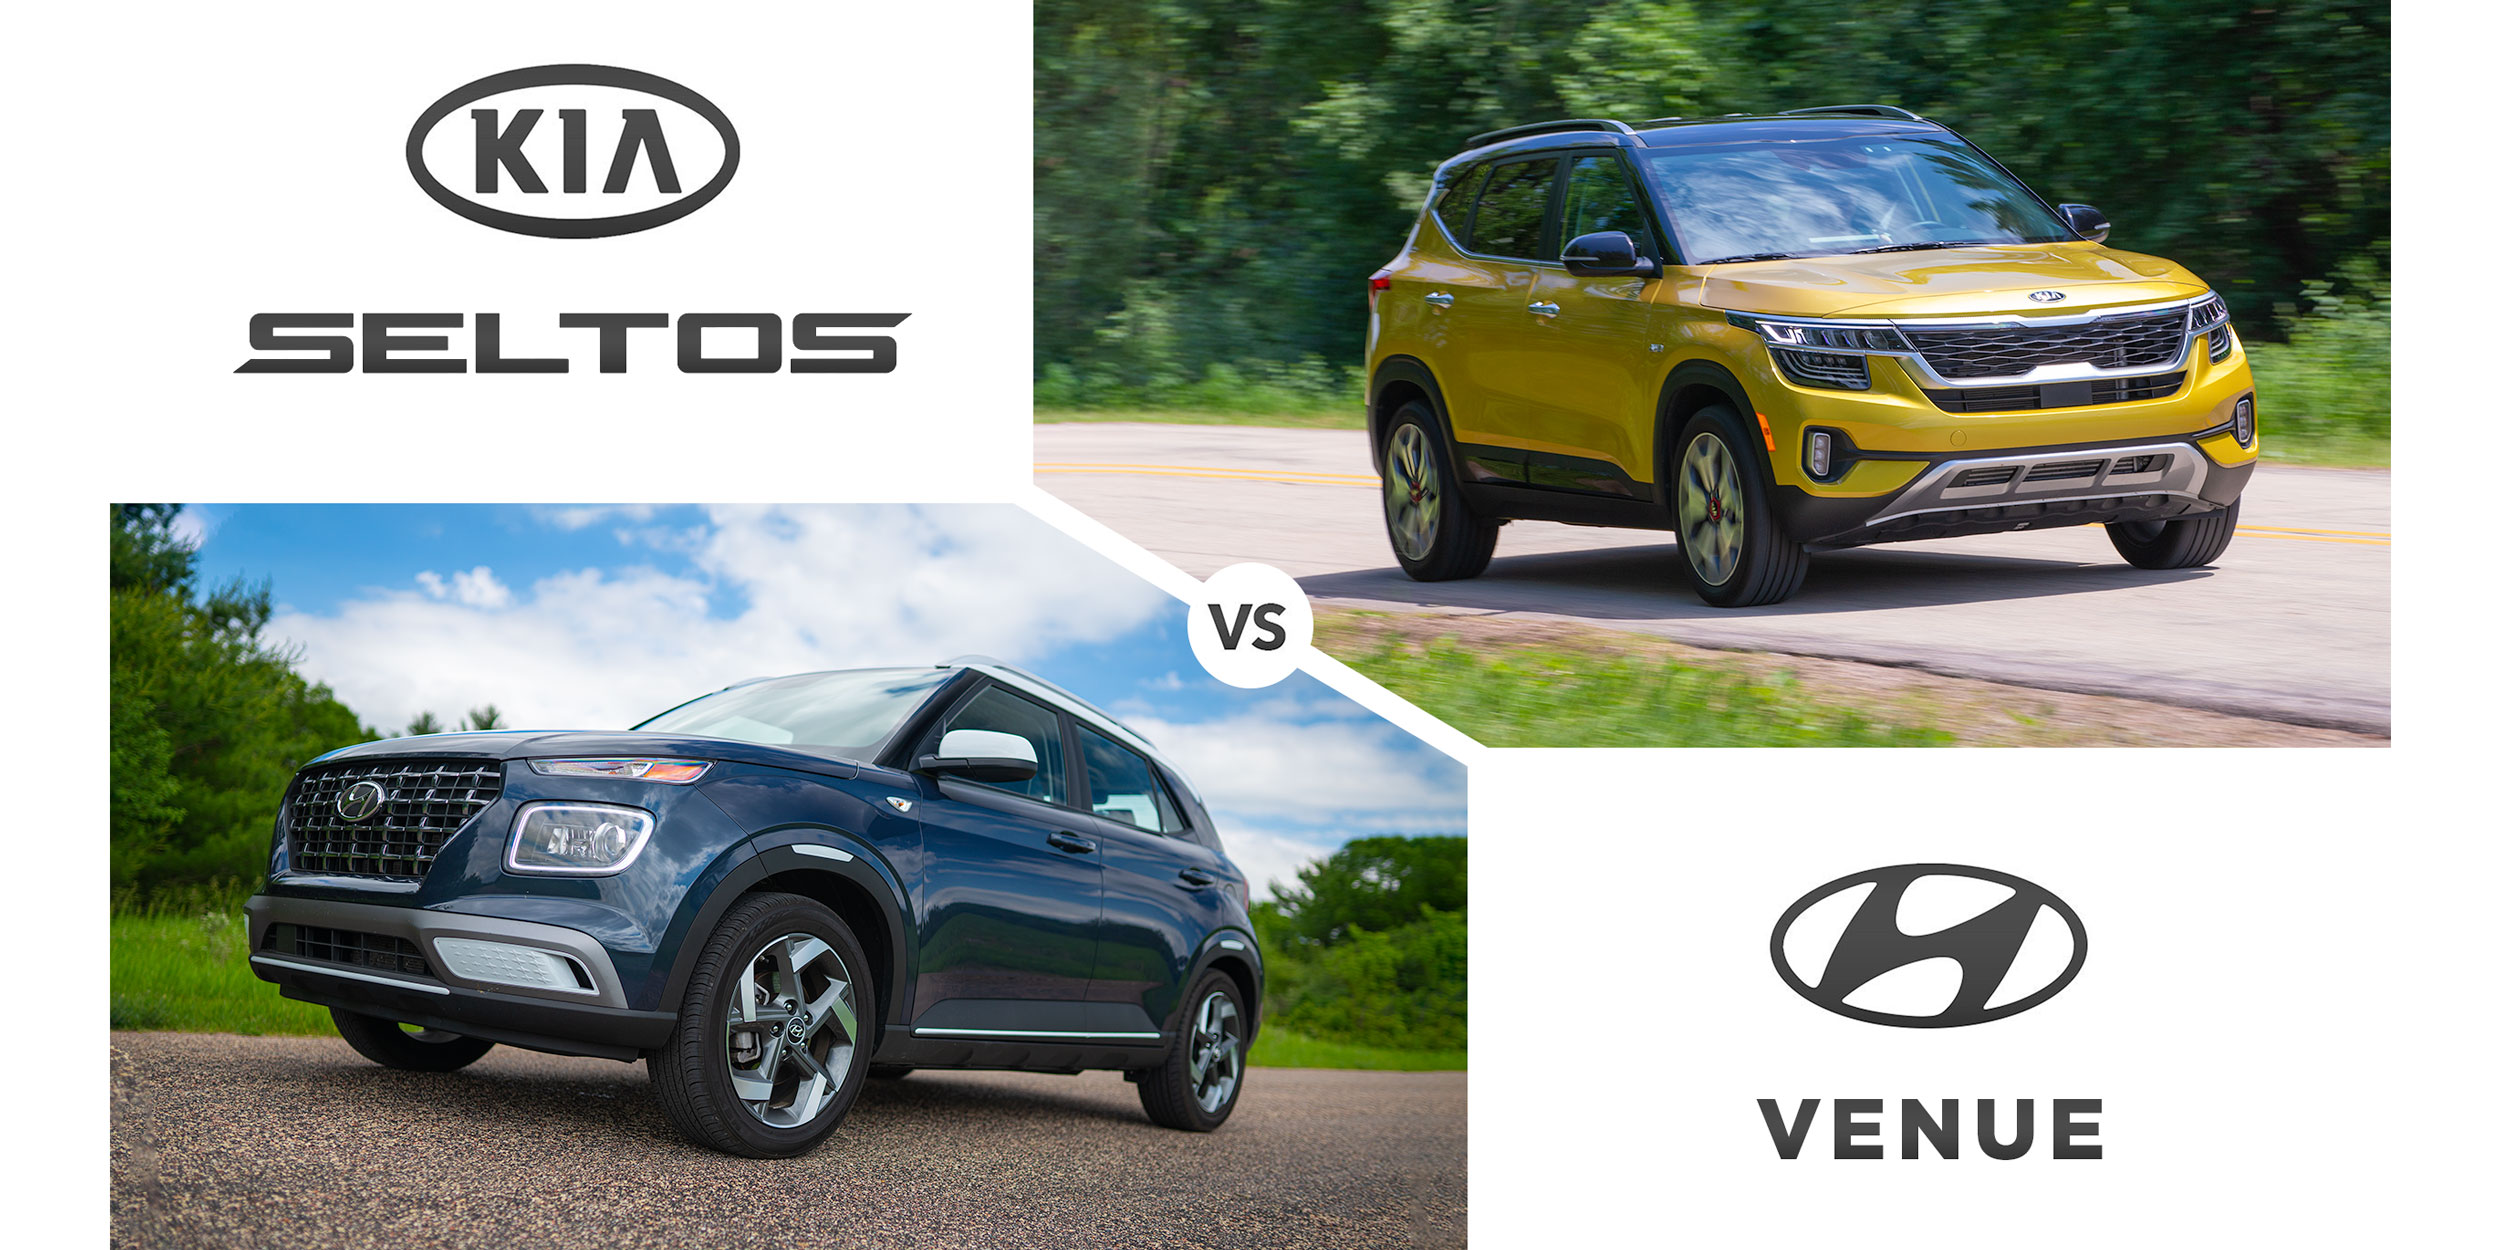 2021 Kia Seltos versus 2020 Hyundai Venue